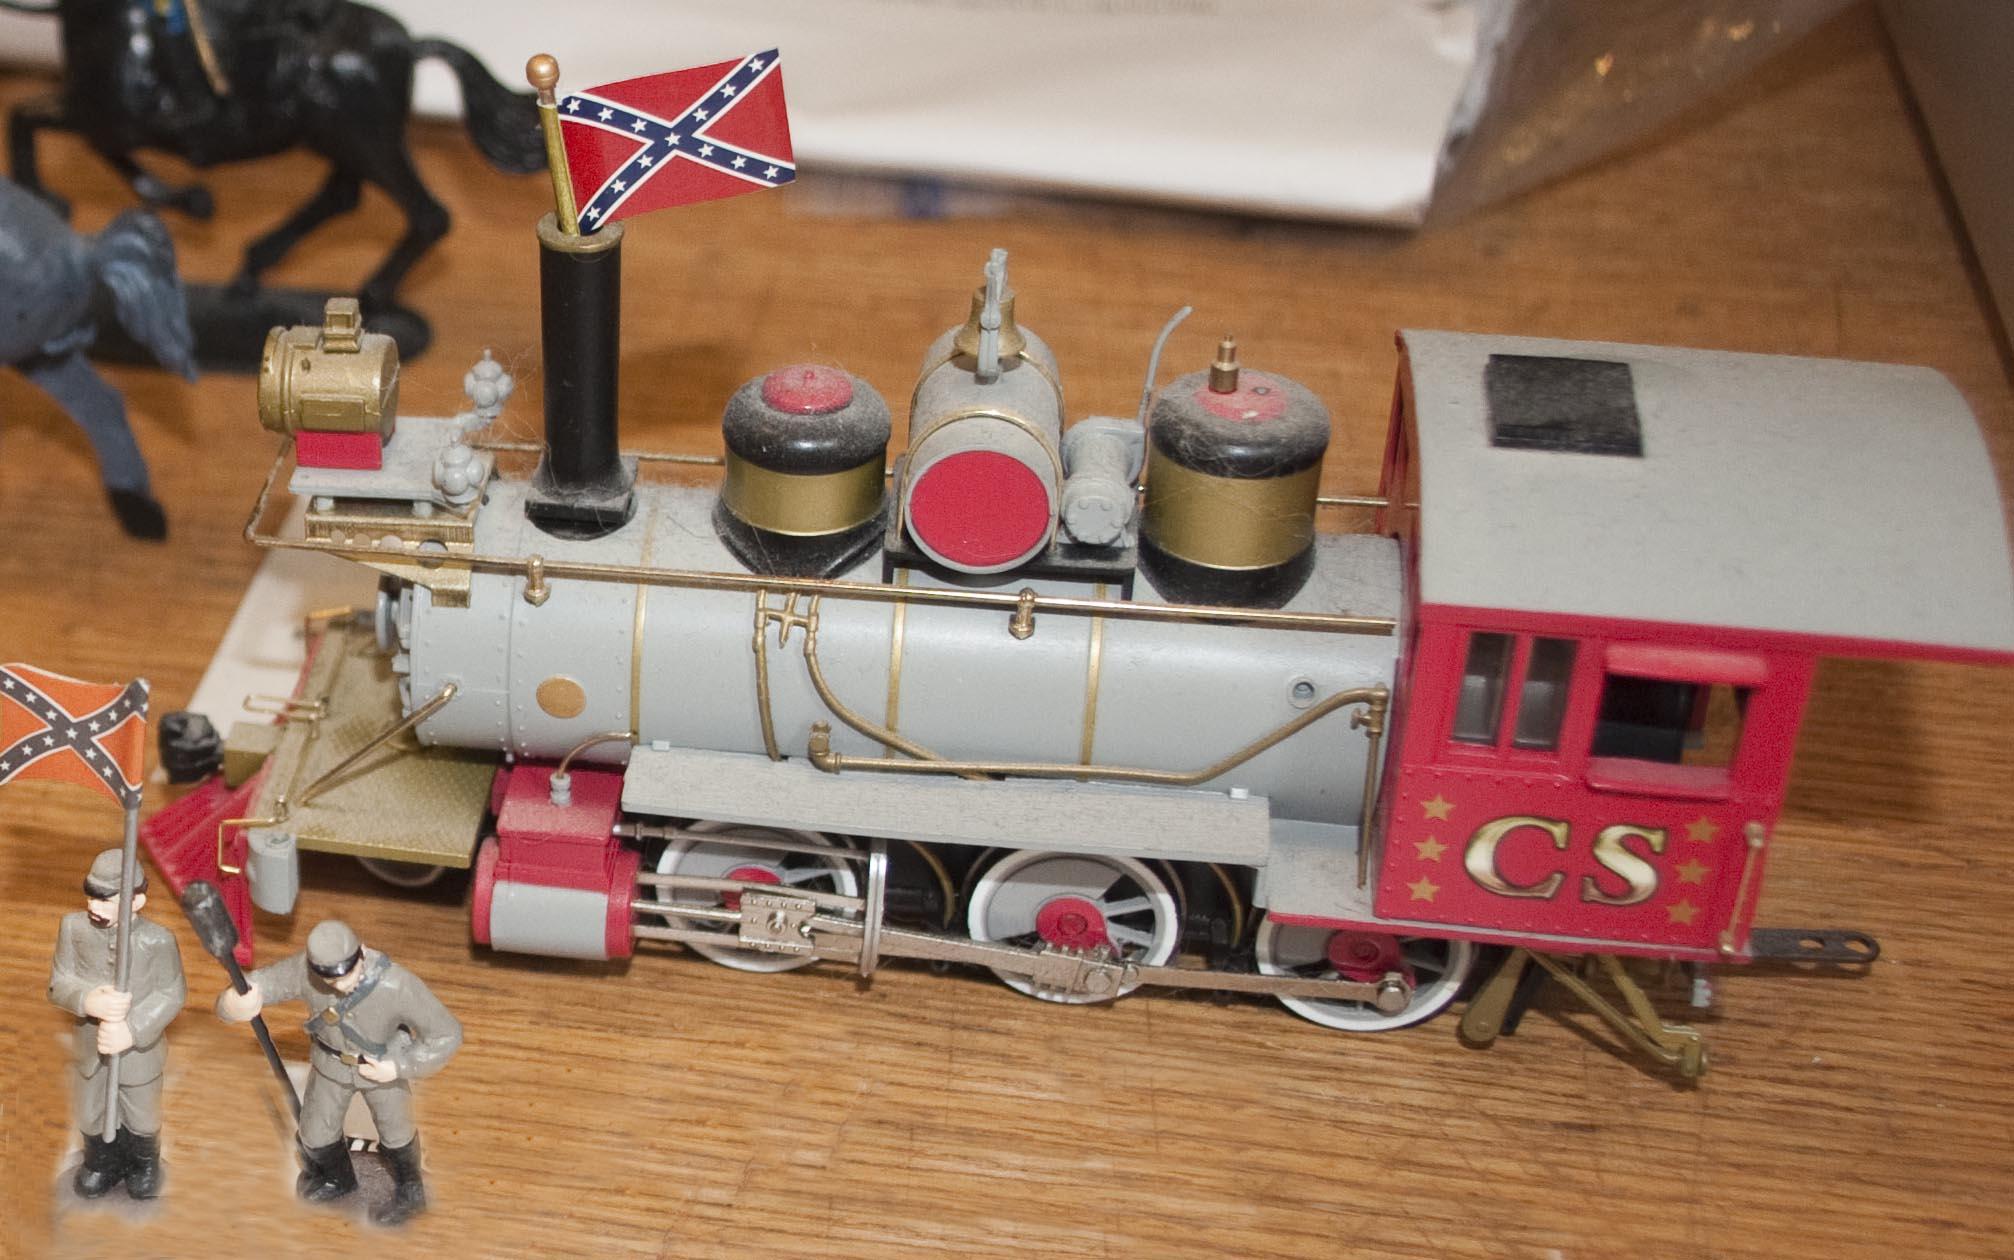 Miniatures Through Time - A Dollhouse Miniatures Exhibit with trains